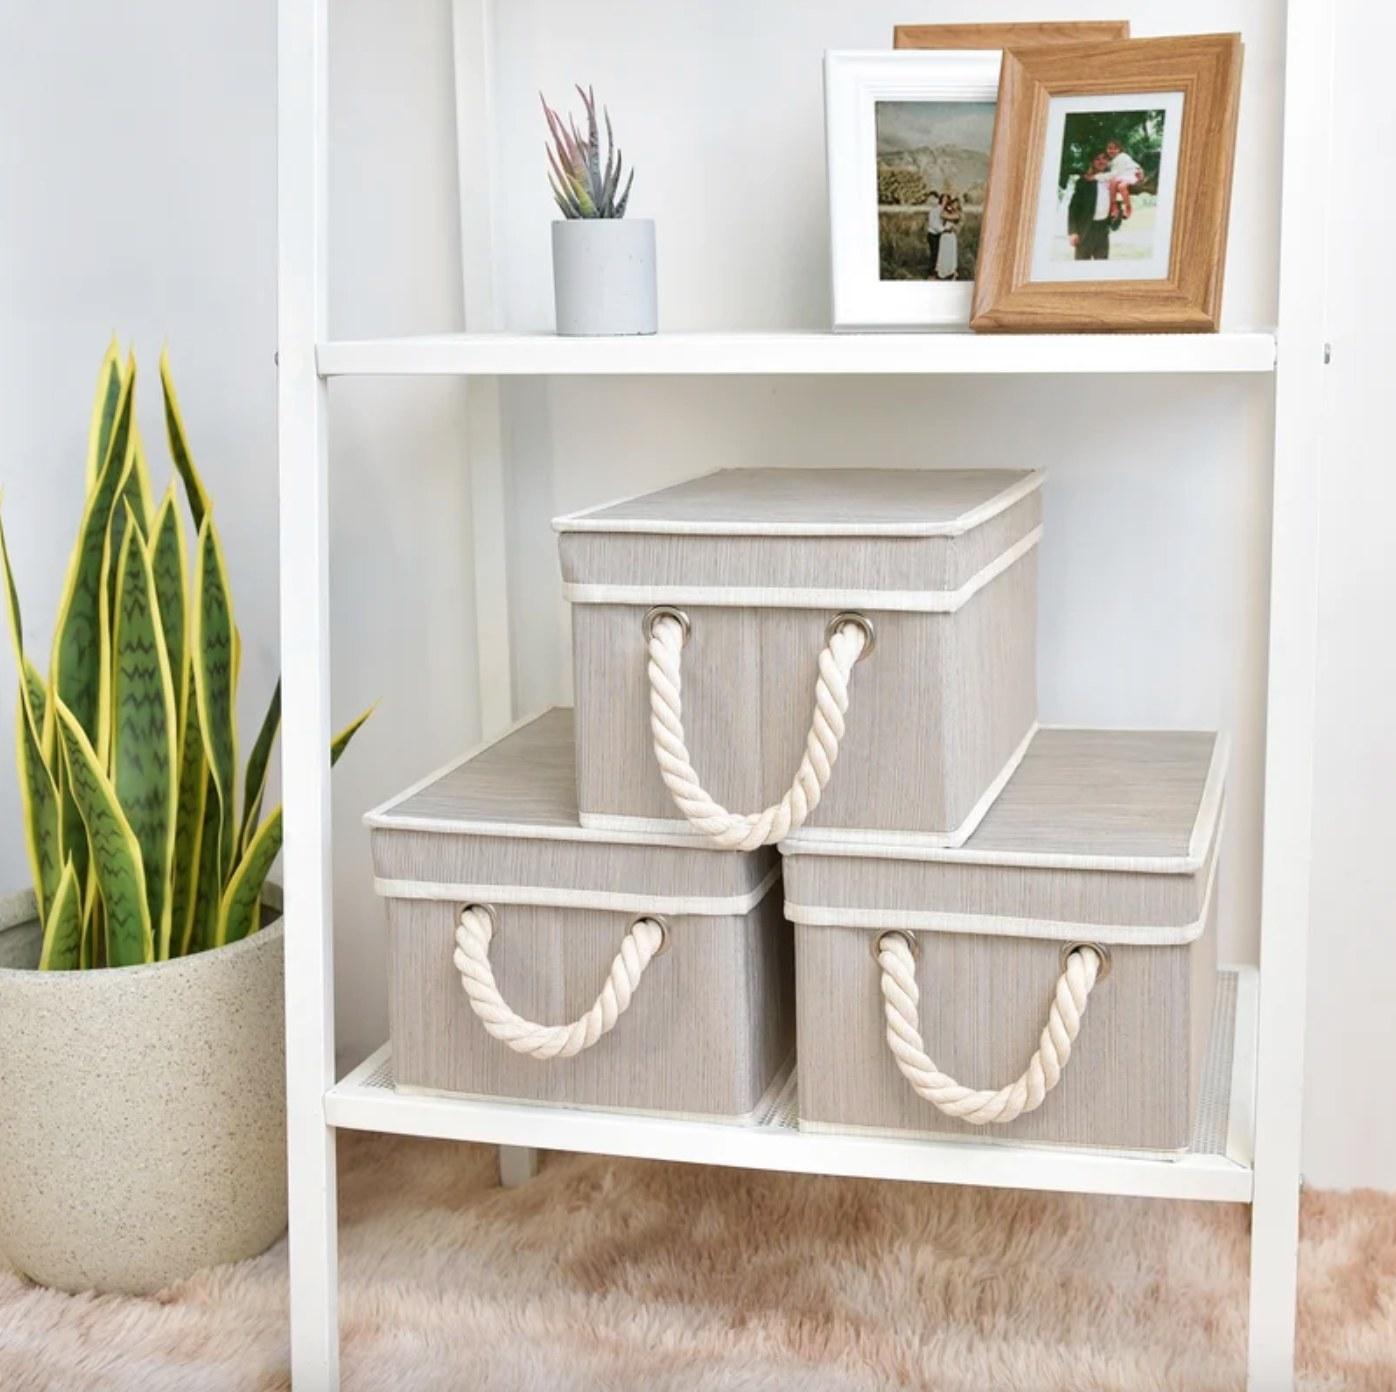 The three-piece fabric storage bin